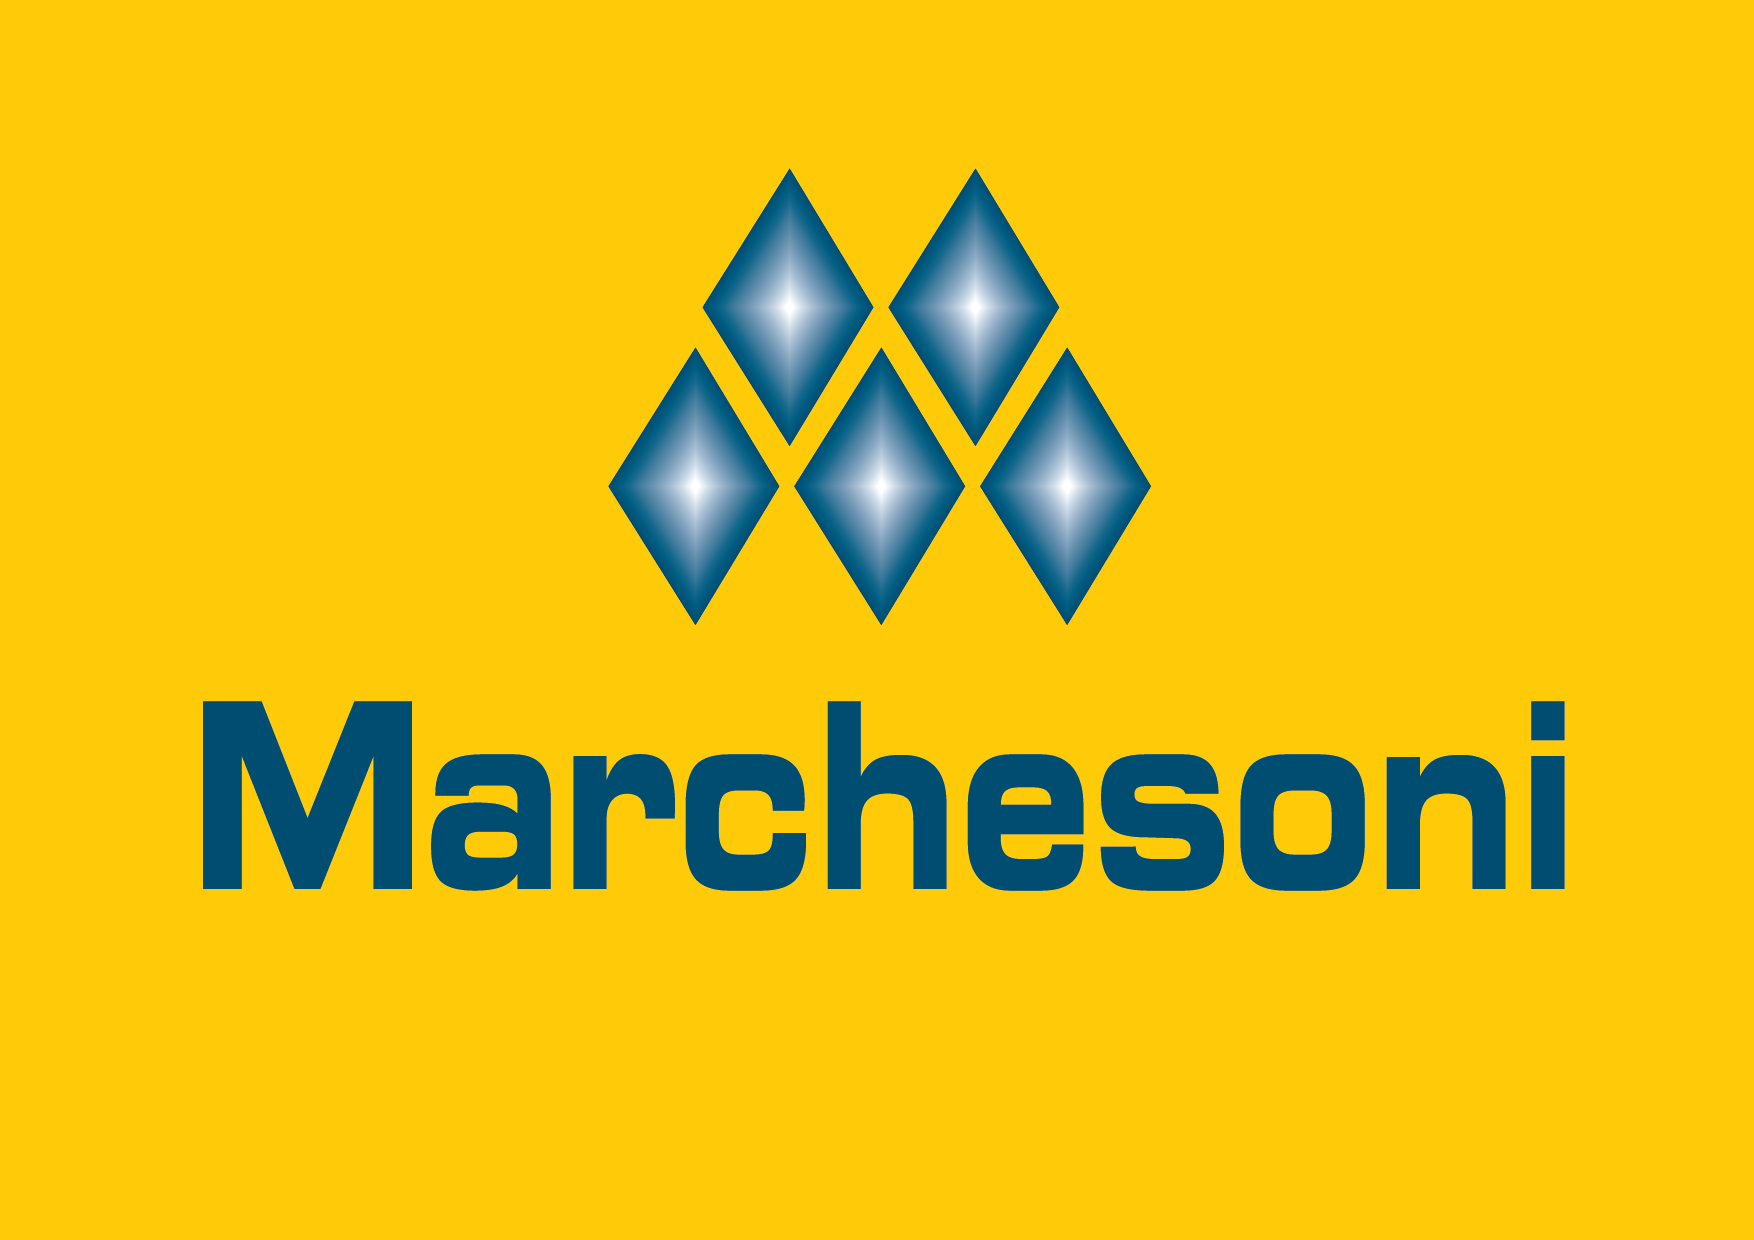 Fritadeira Elétrica Marchesoni 4 litros - FT.1.401/402  - Carmel Equipamentos